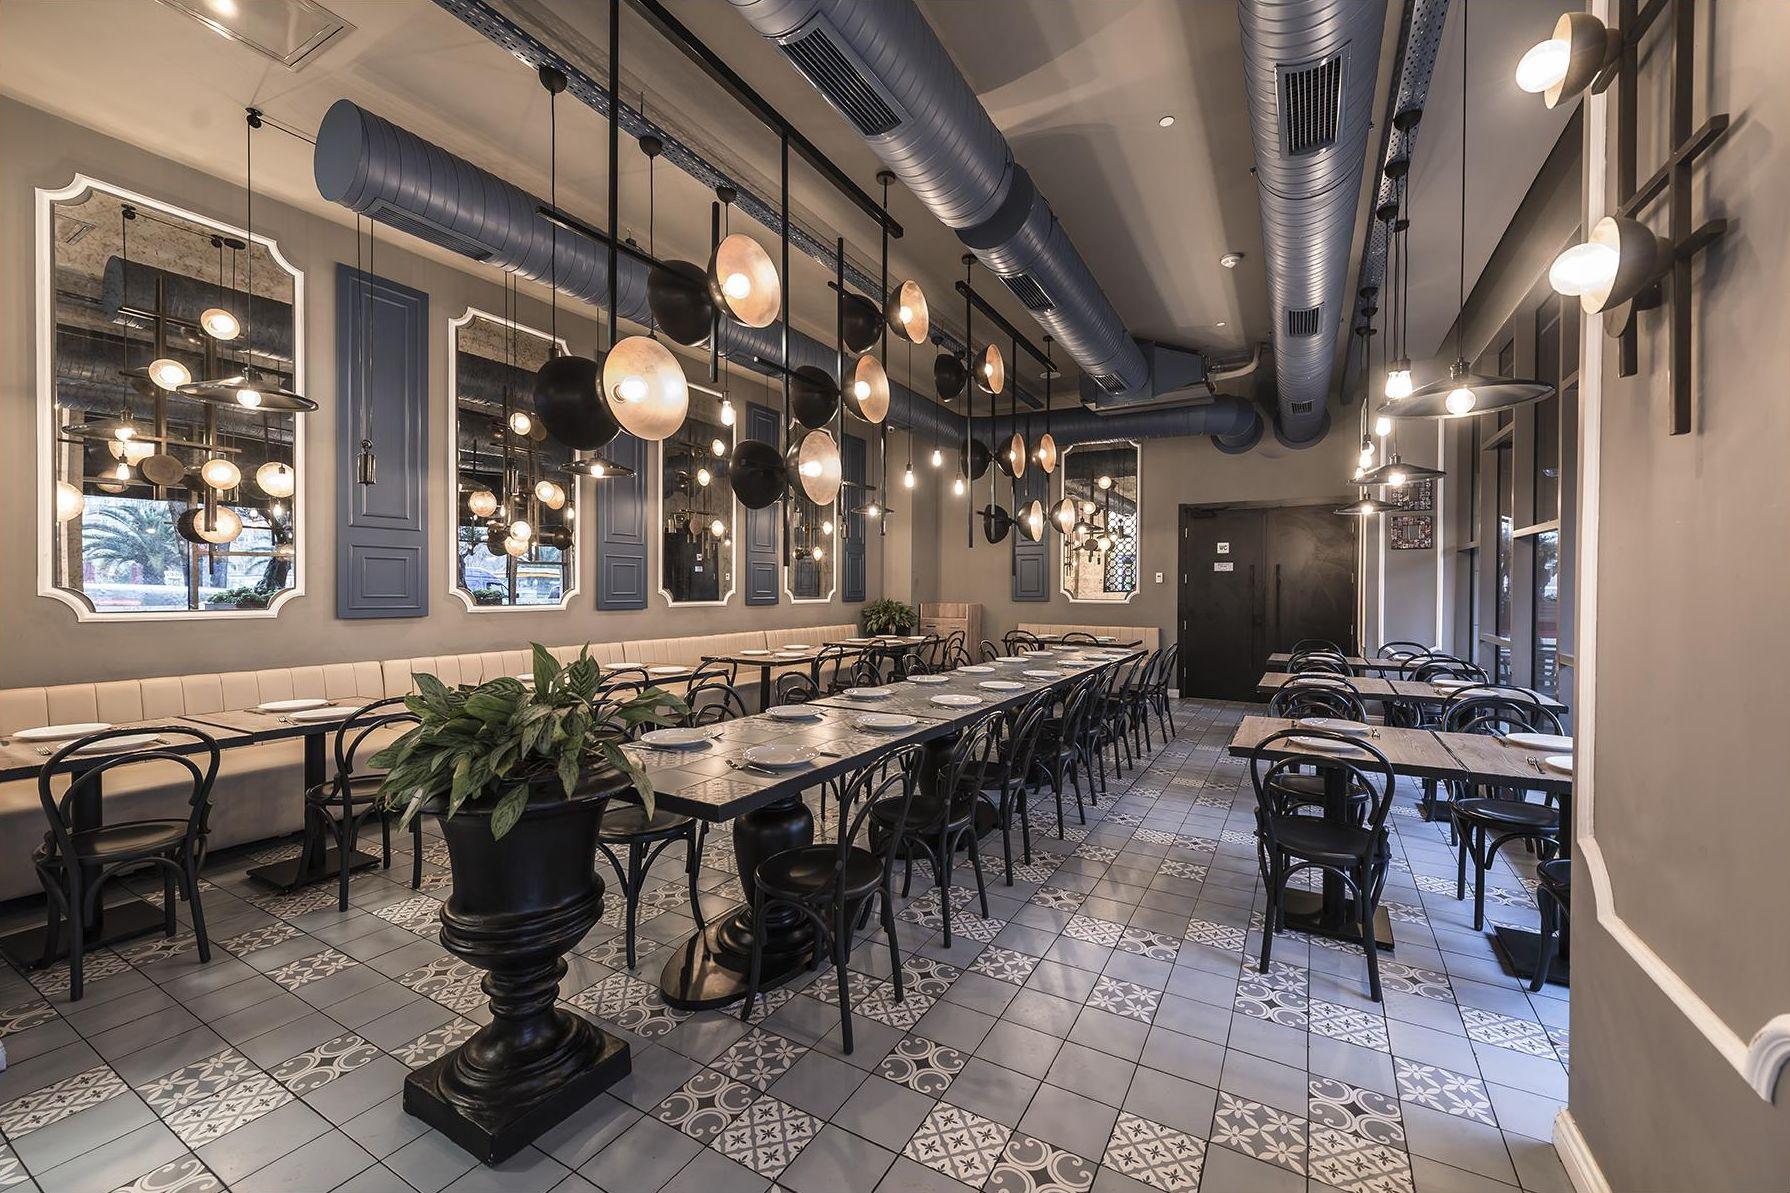 Организация и проектирование вентиляции кафе и ресторана